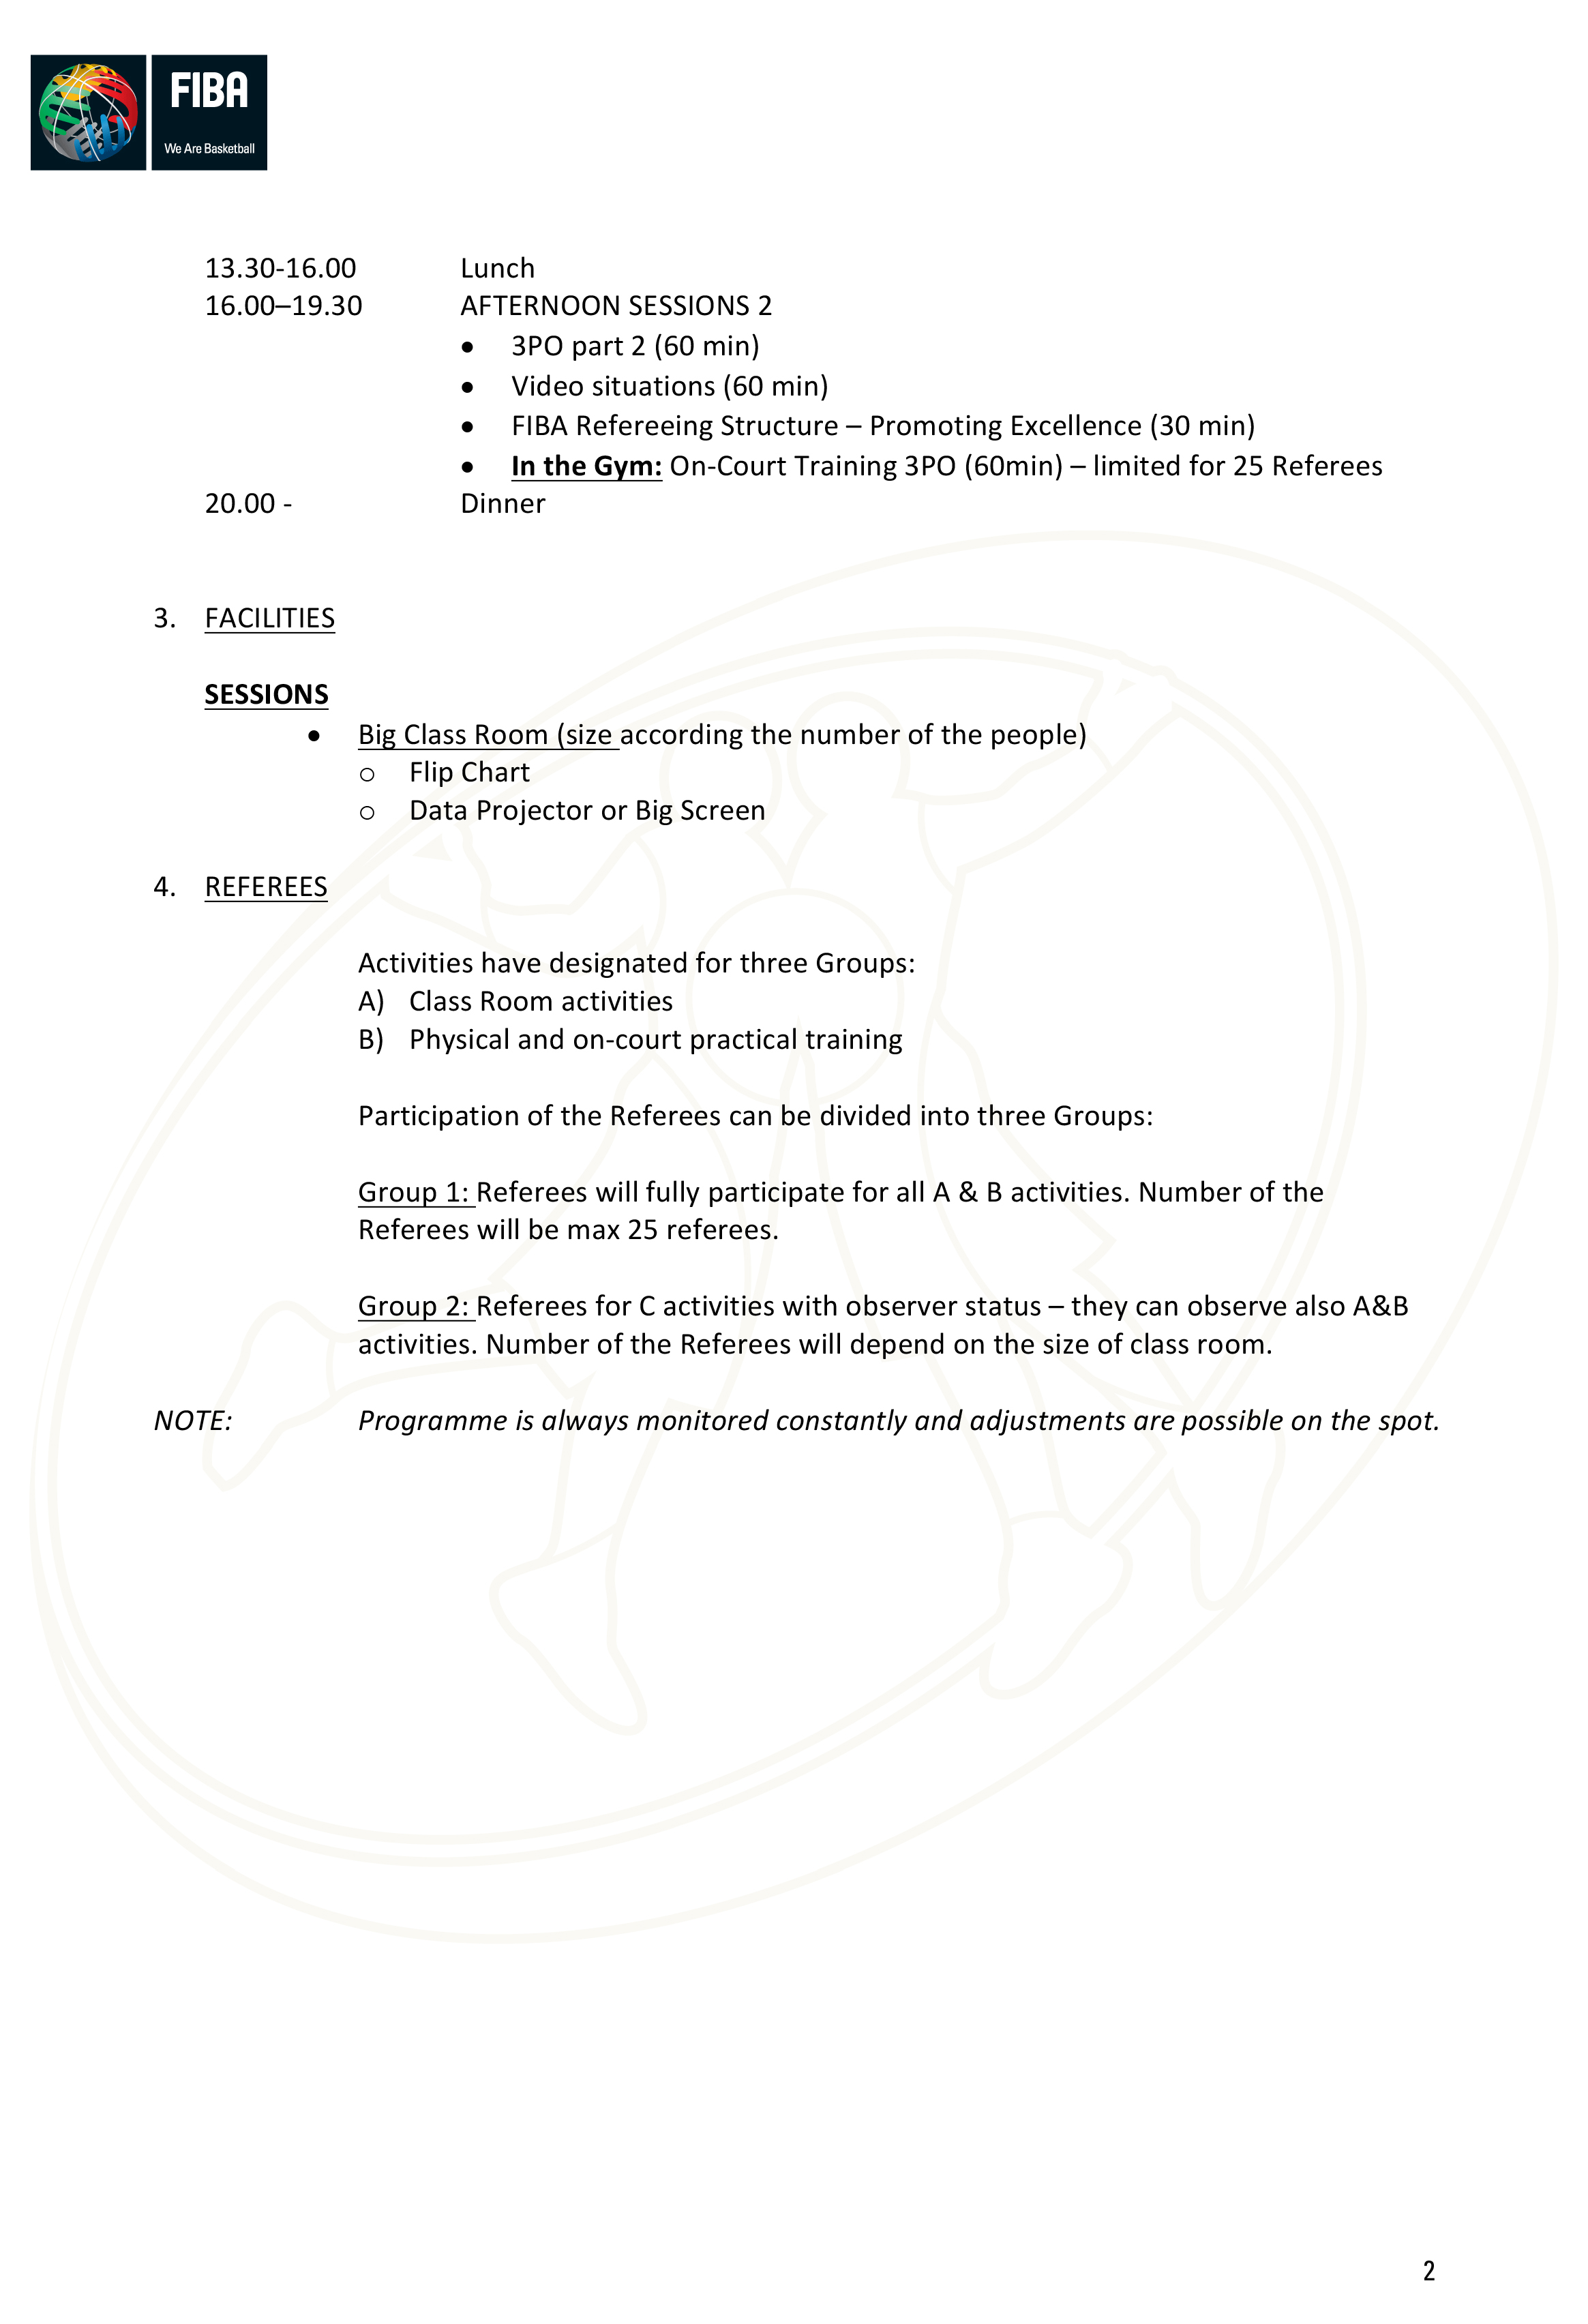 Microsoft Word – Rabat_MOR_CAMP2016_Programme.docx